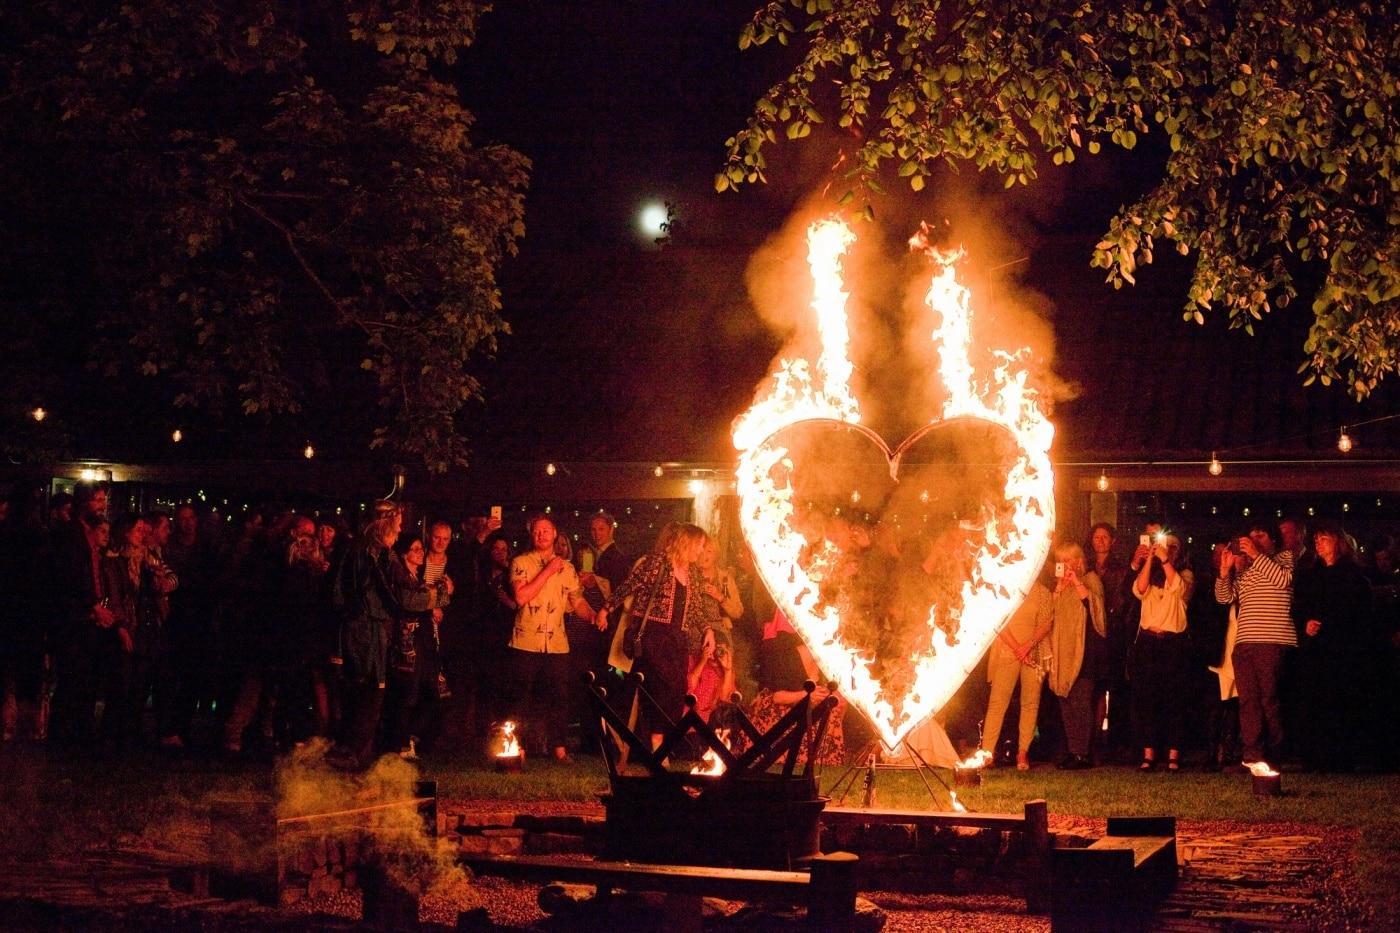 DC-Heart-at-Wainhouse-Barn Winter Weddings at Dewsall Court